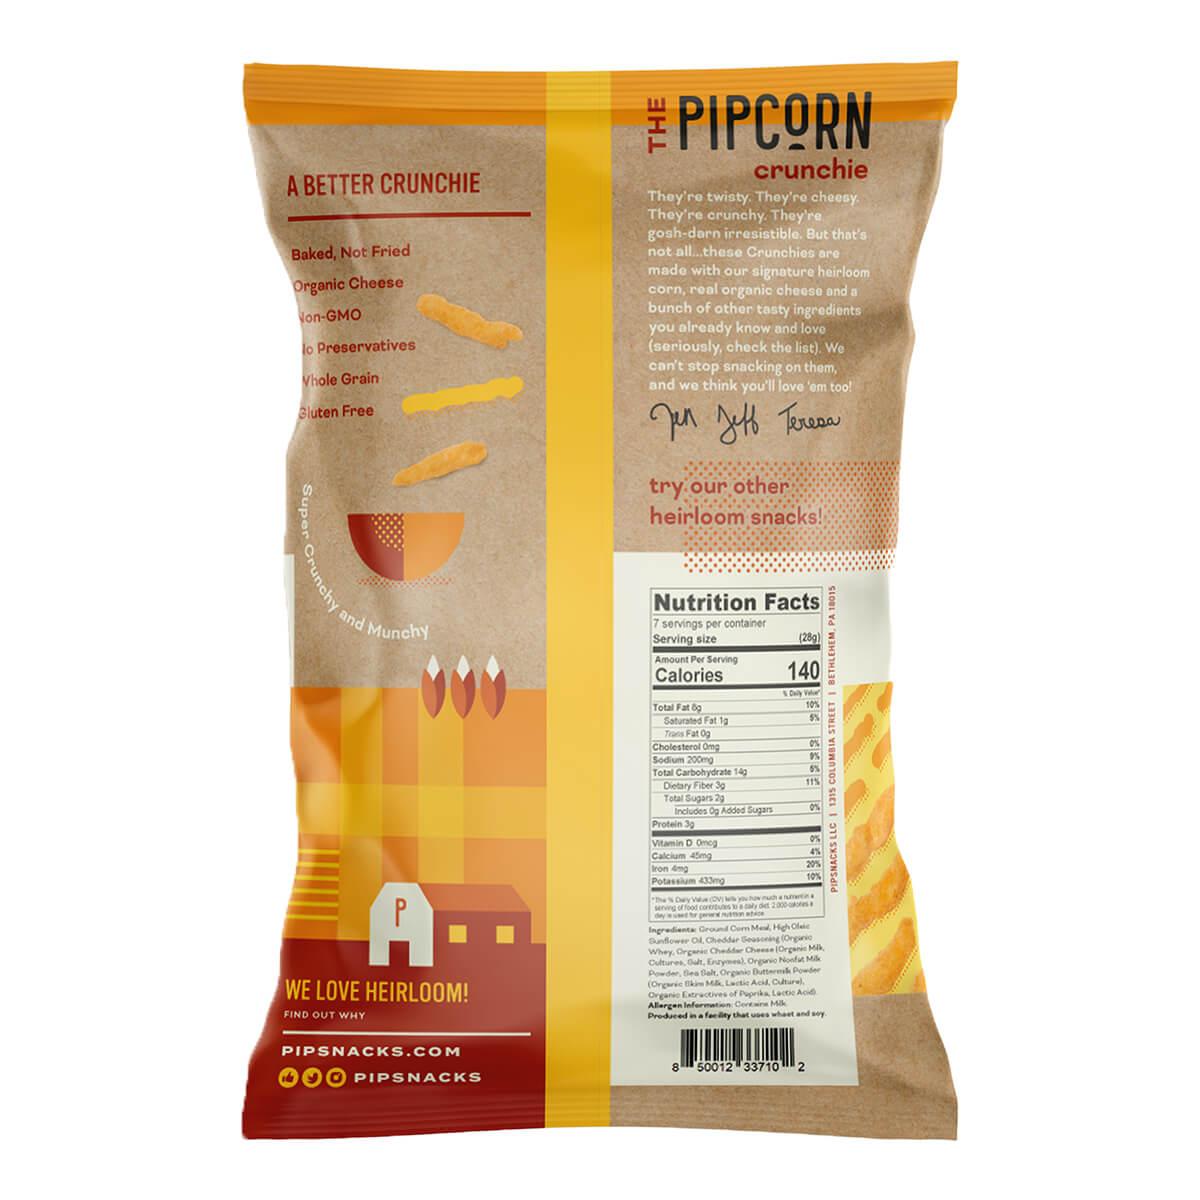 Pipcorn Cheddar Crunchies - back